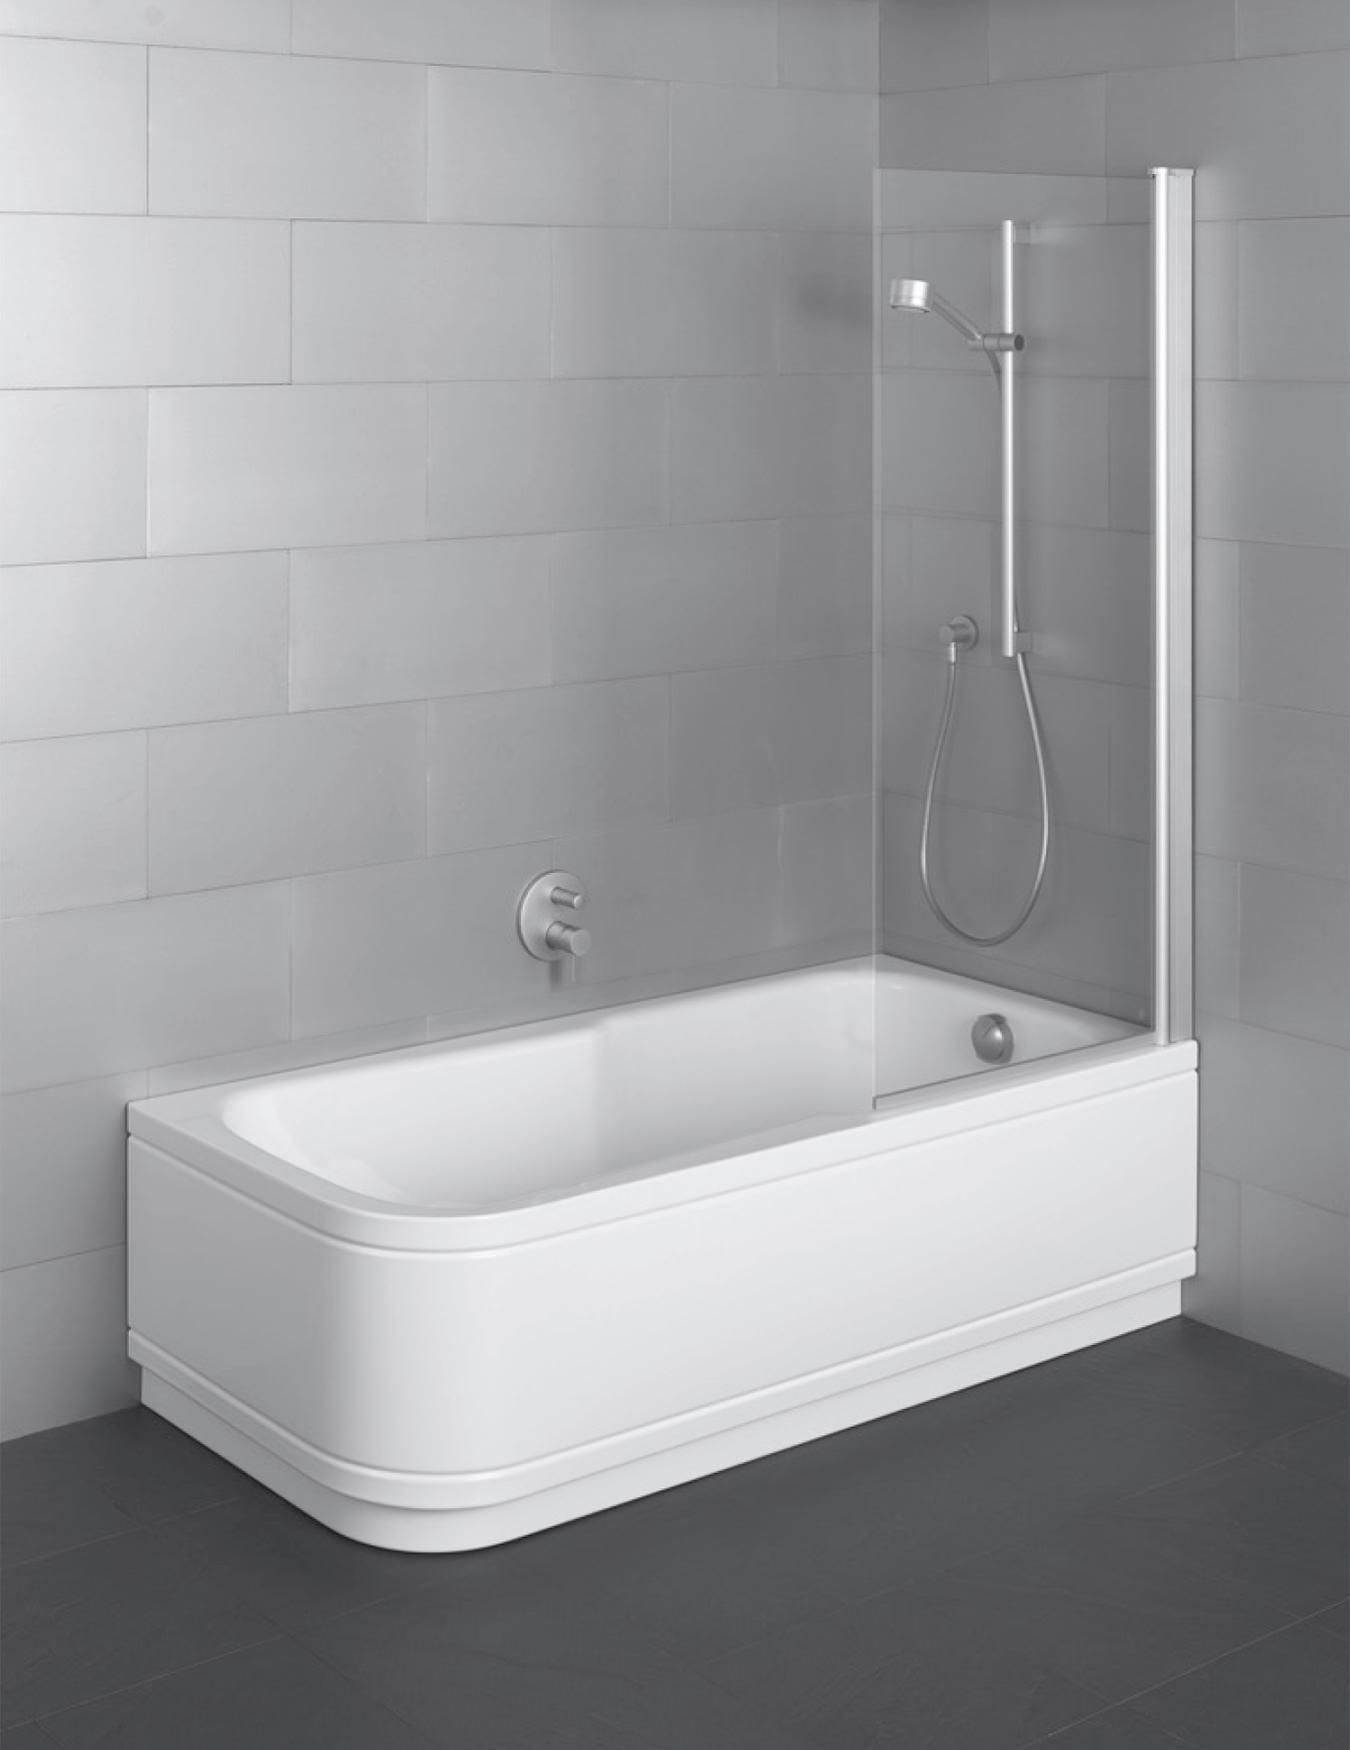 Set Comfort Corner Super Steel Shower Bath 1800 x 800mm LH